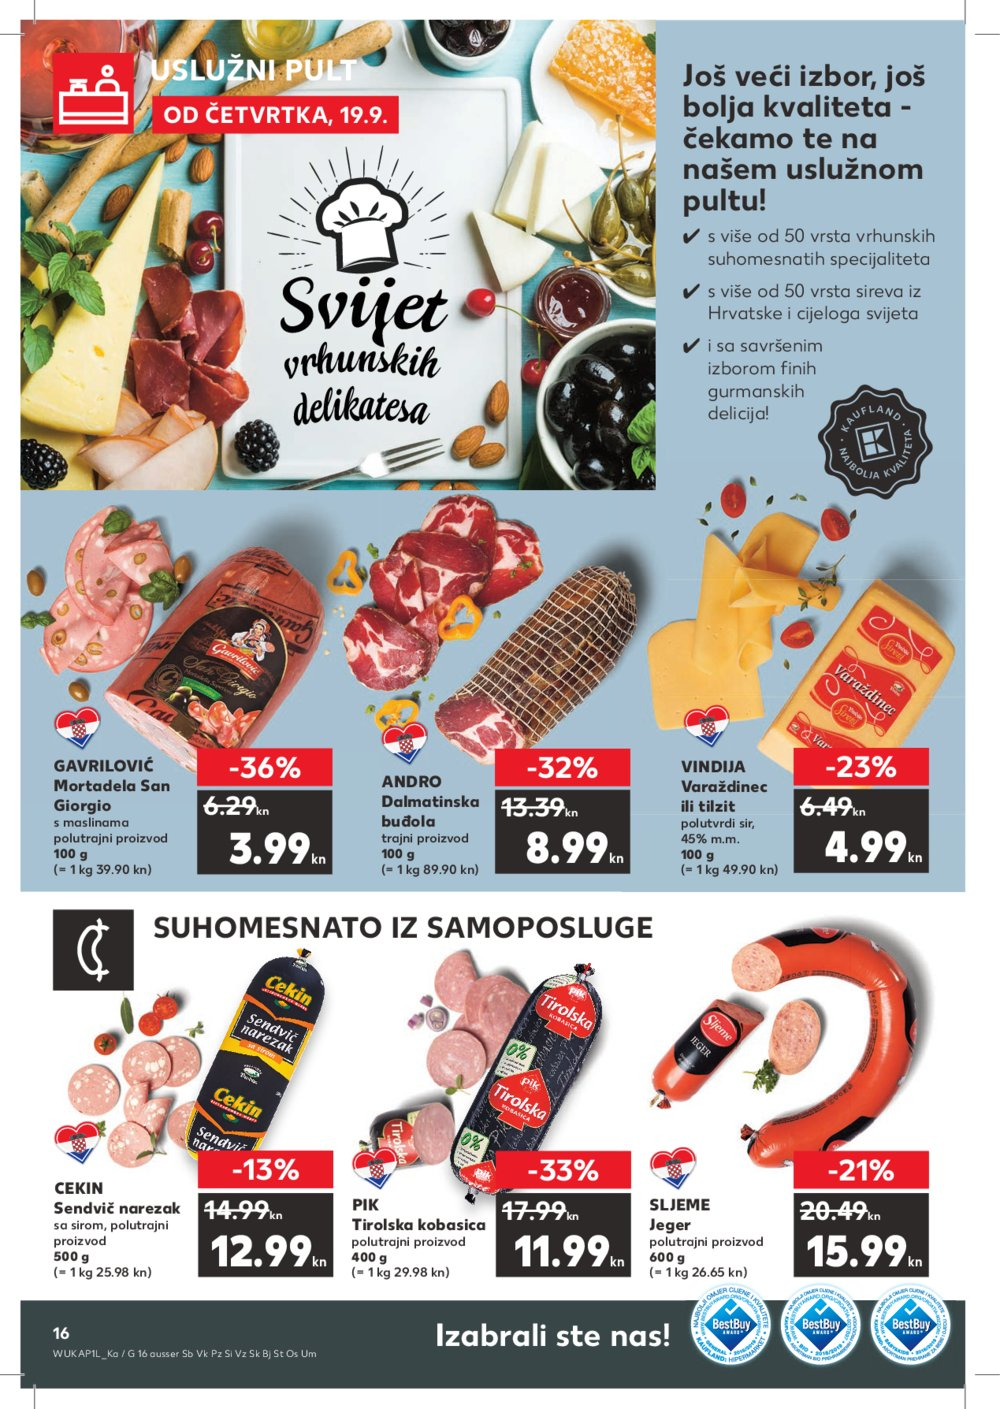 Kaufland katalog Akcija 19.09.-25.09.2019.